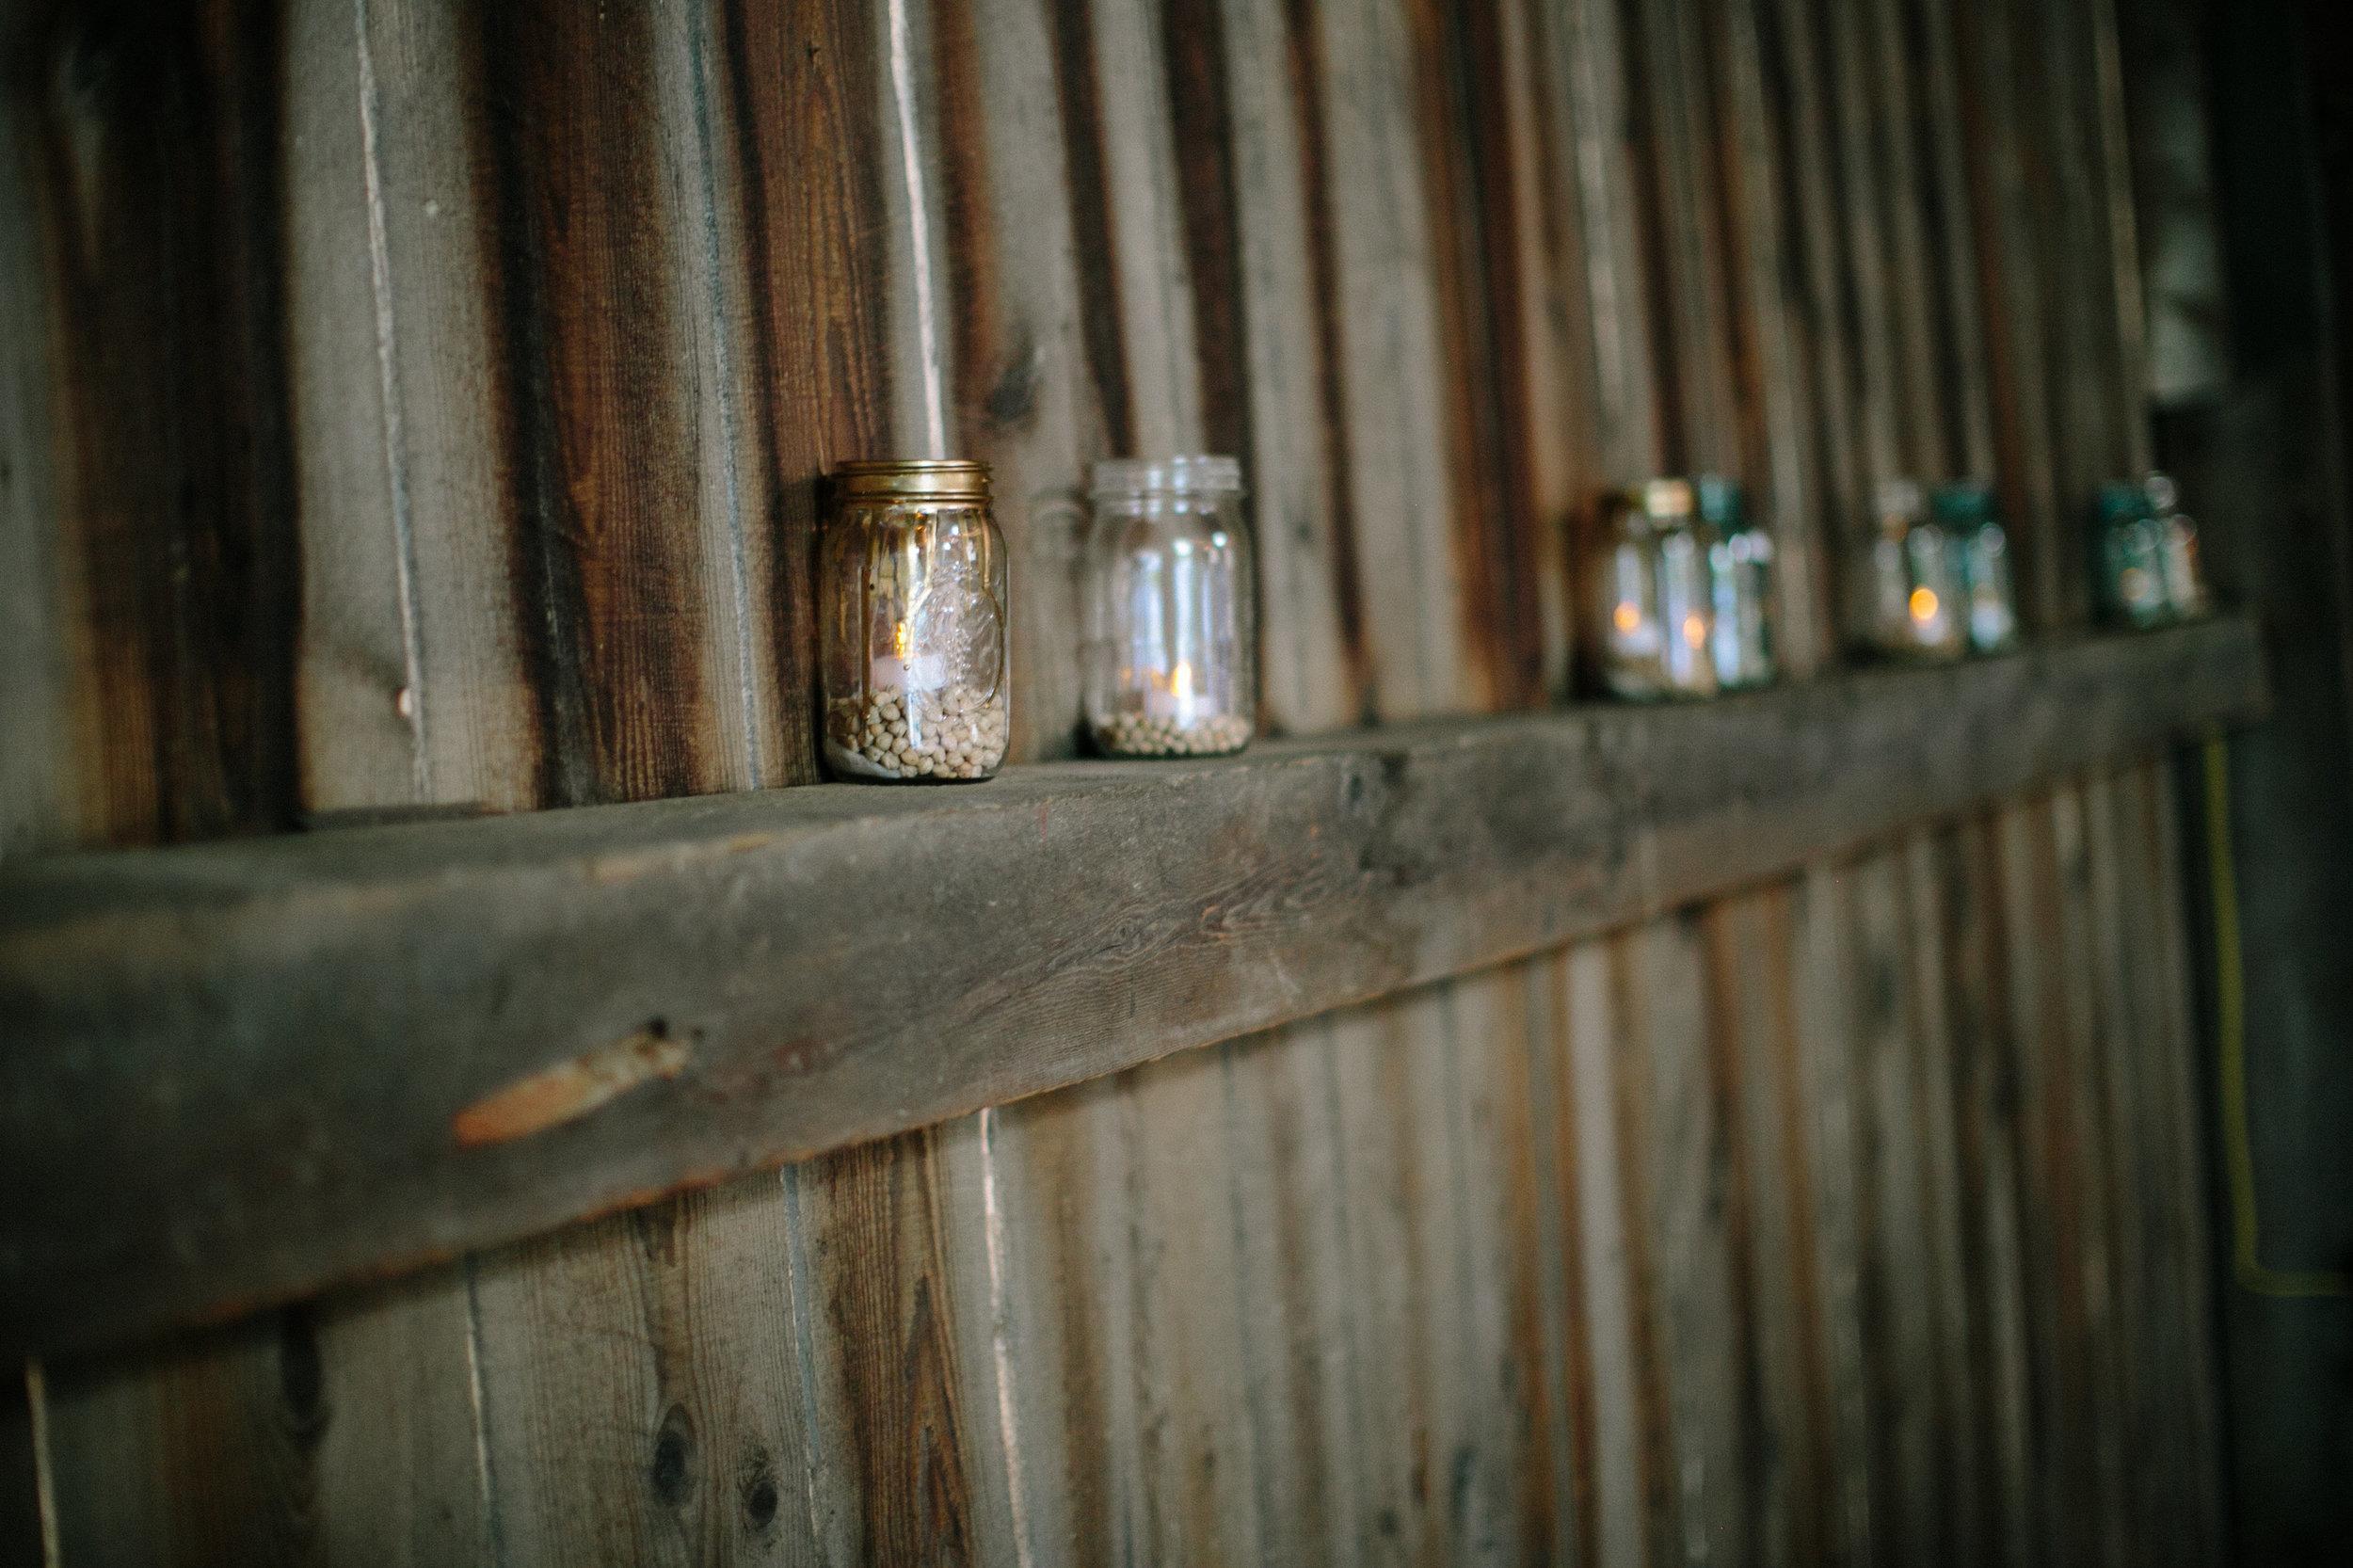 Decor by: Thebackdropshopblog.com